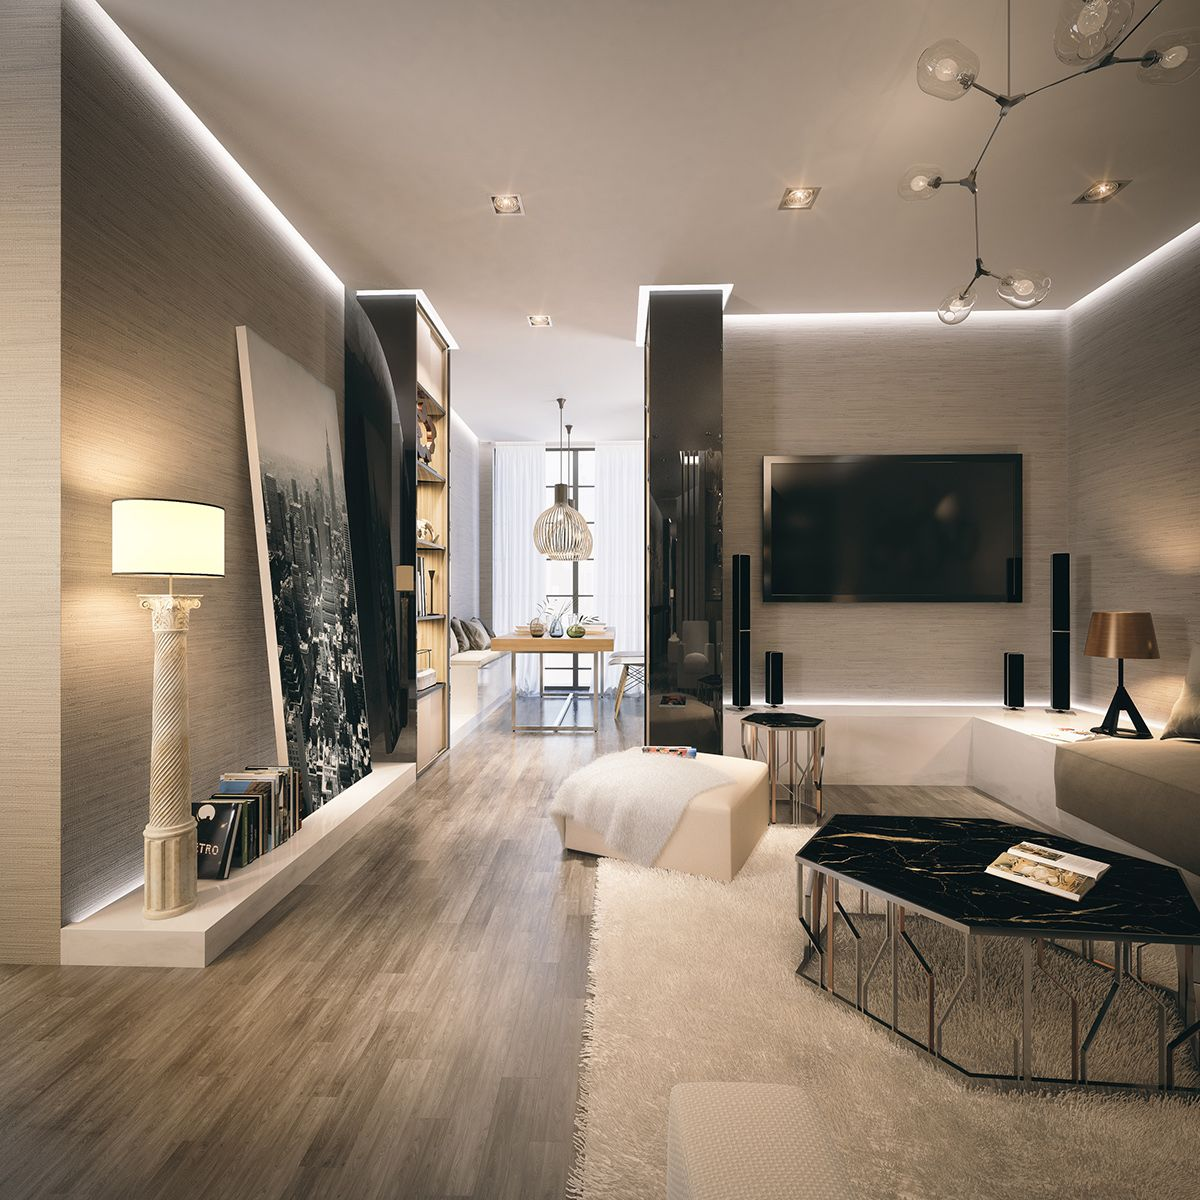 Private luxury apartments complex in western africa full for Luxury interior design dubai